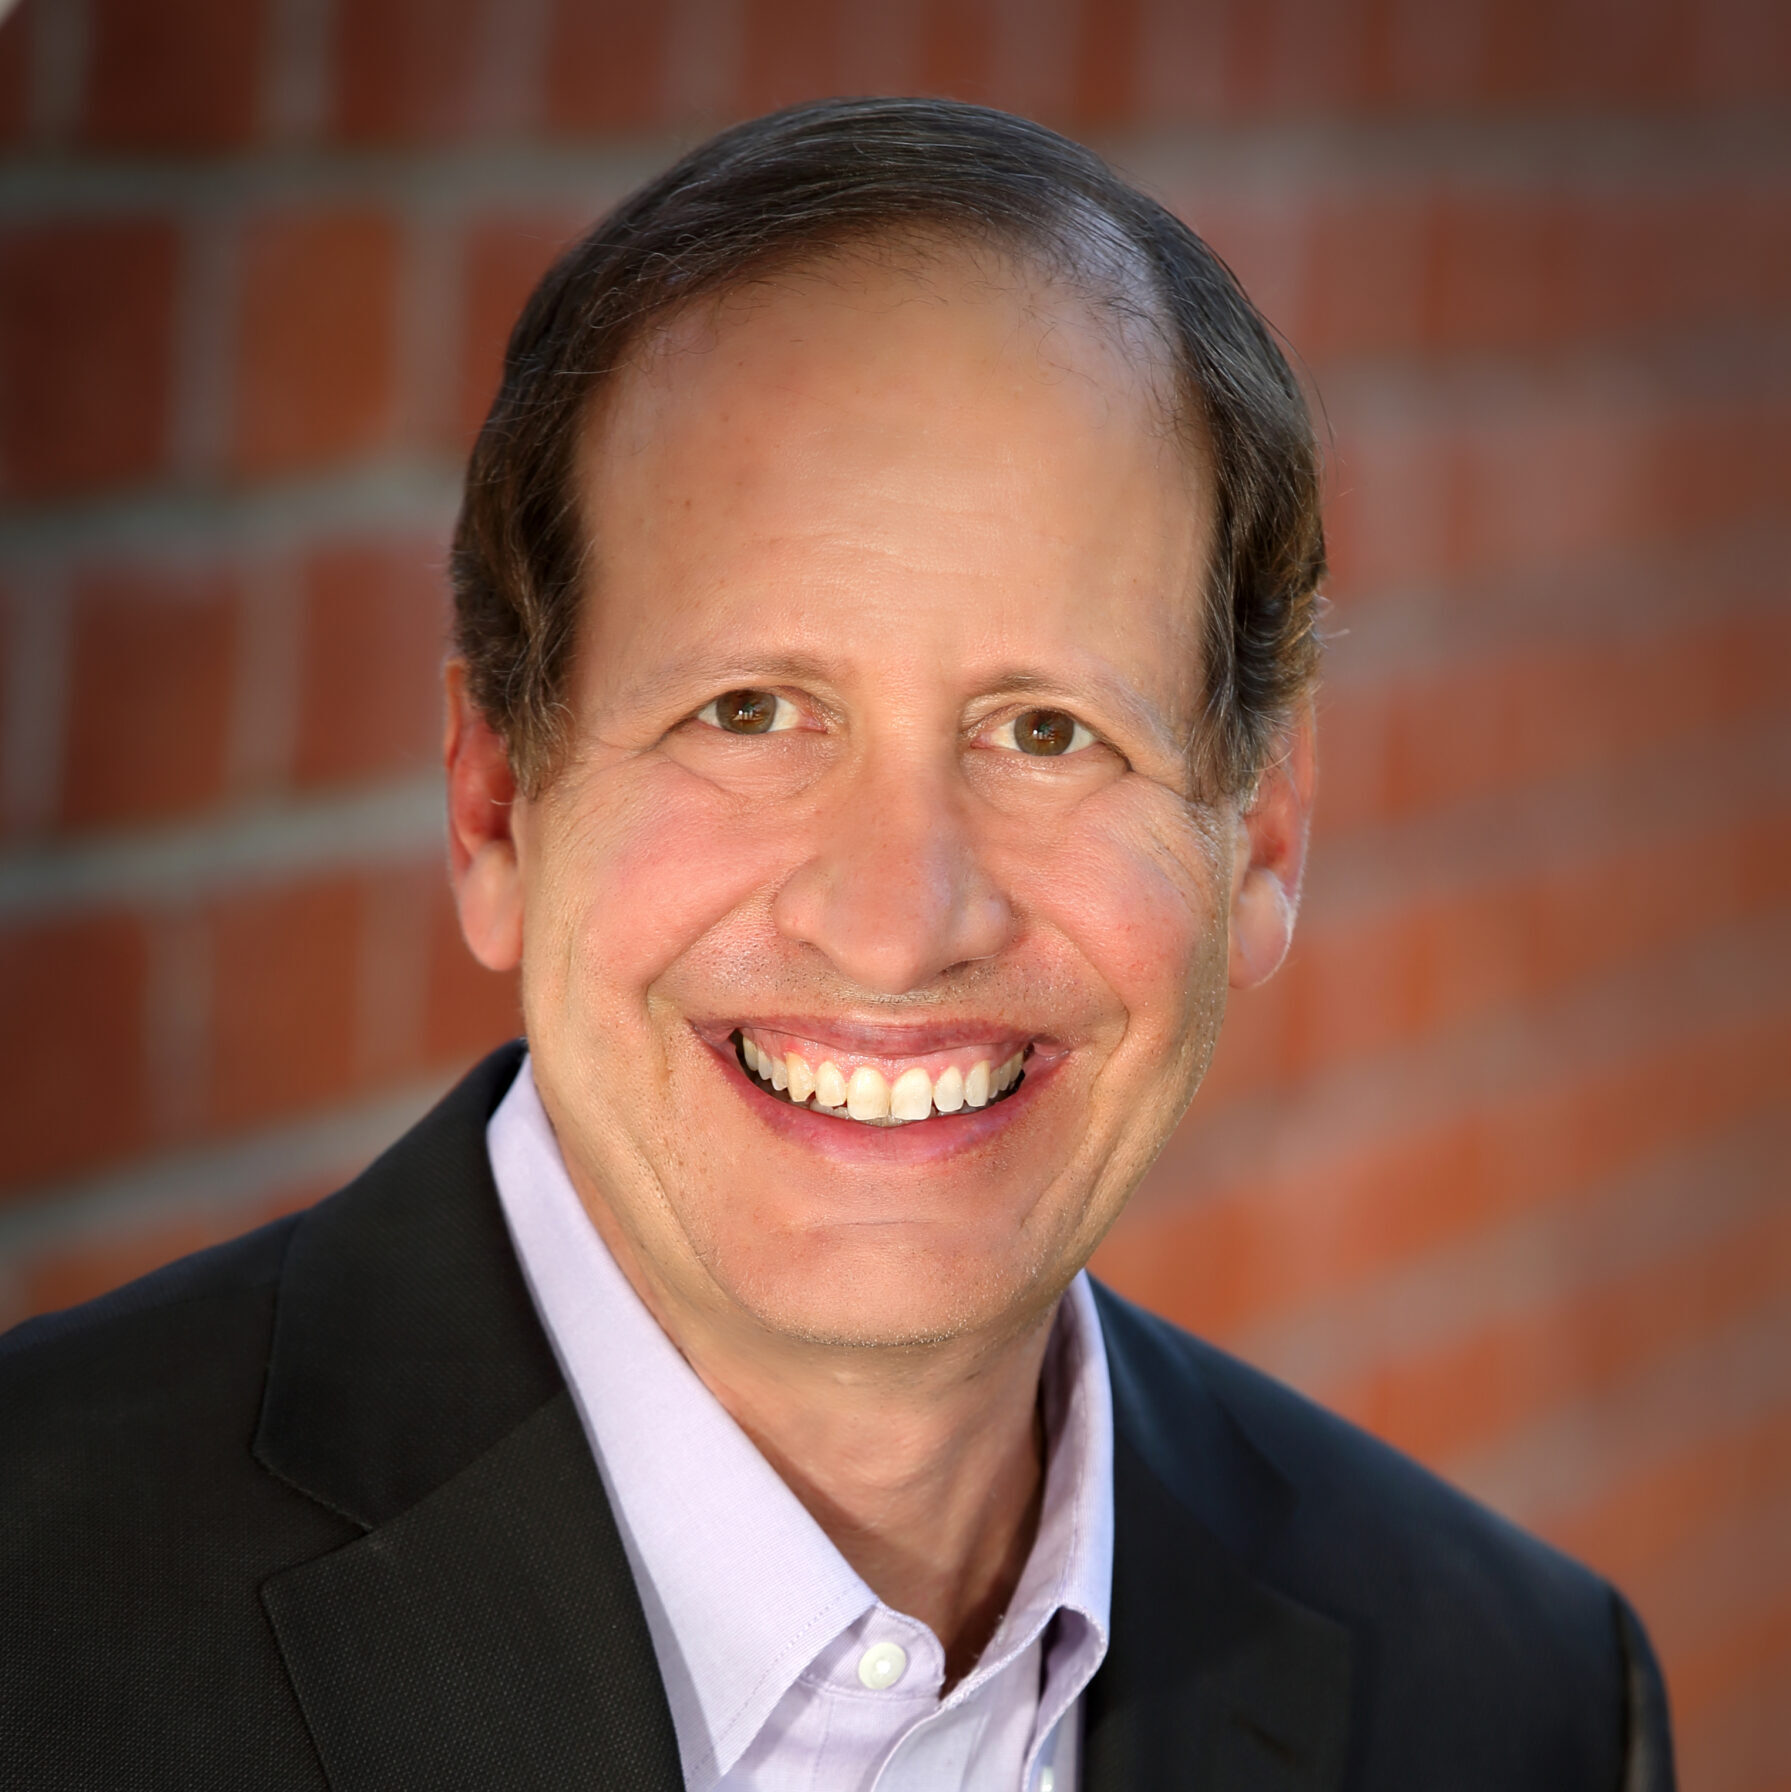 Michael Galper